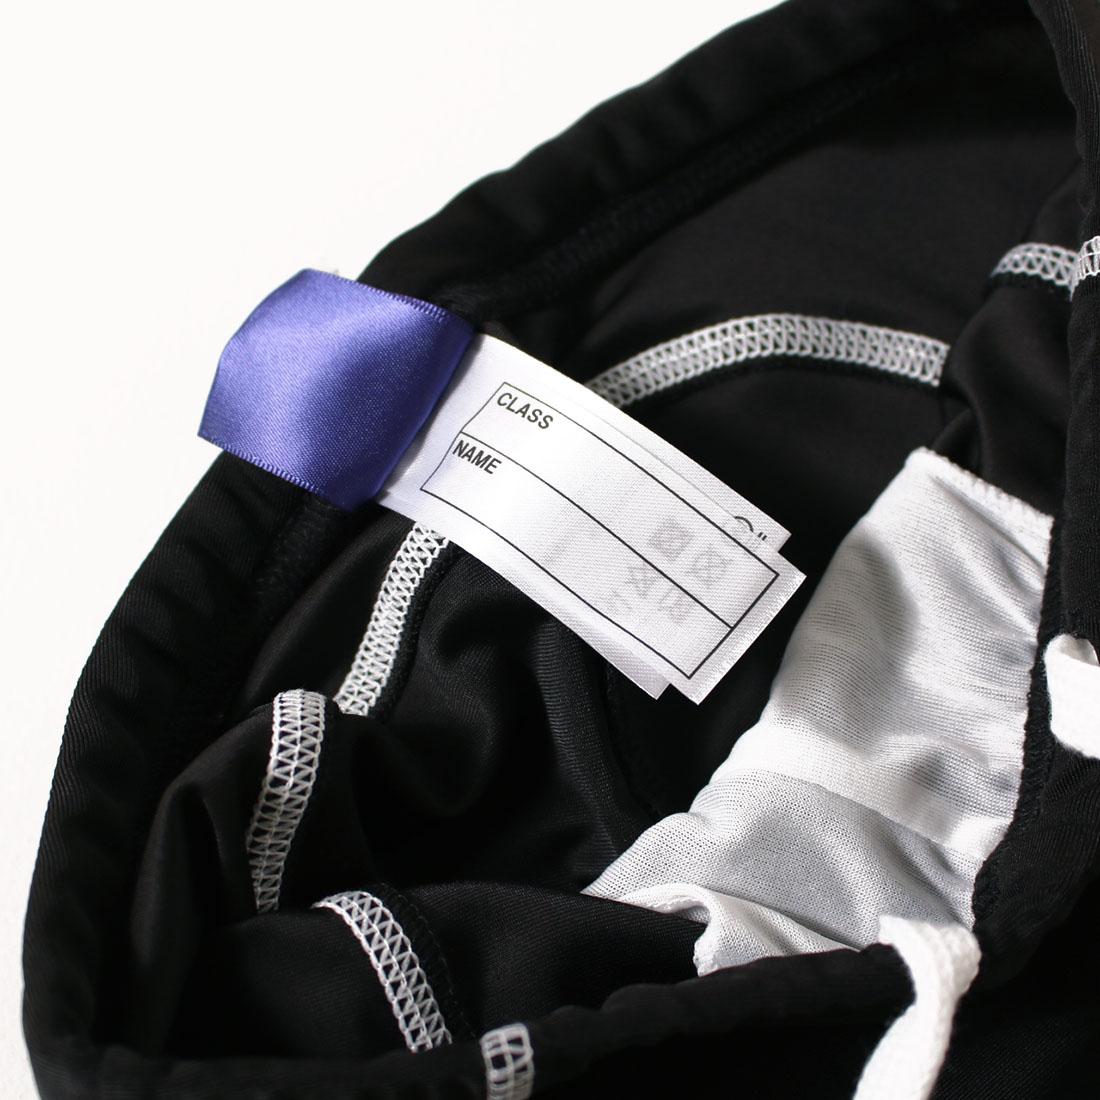 Champion チャンピオンスイミングパンツ(130cm 140cm 150cm 160cm)ボーイズ 男の子 水着 【メール便可】